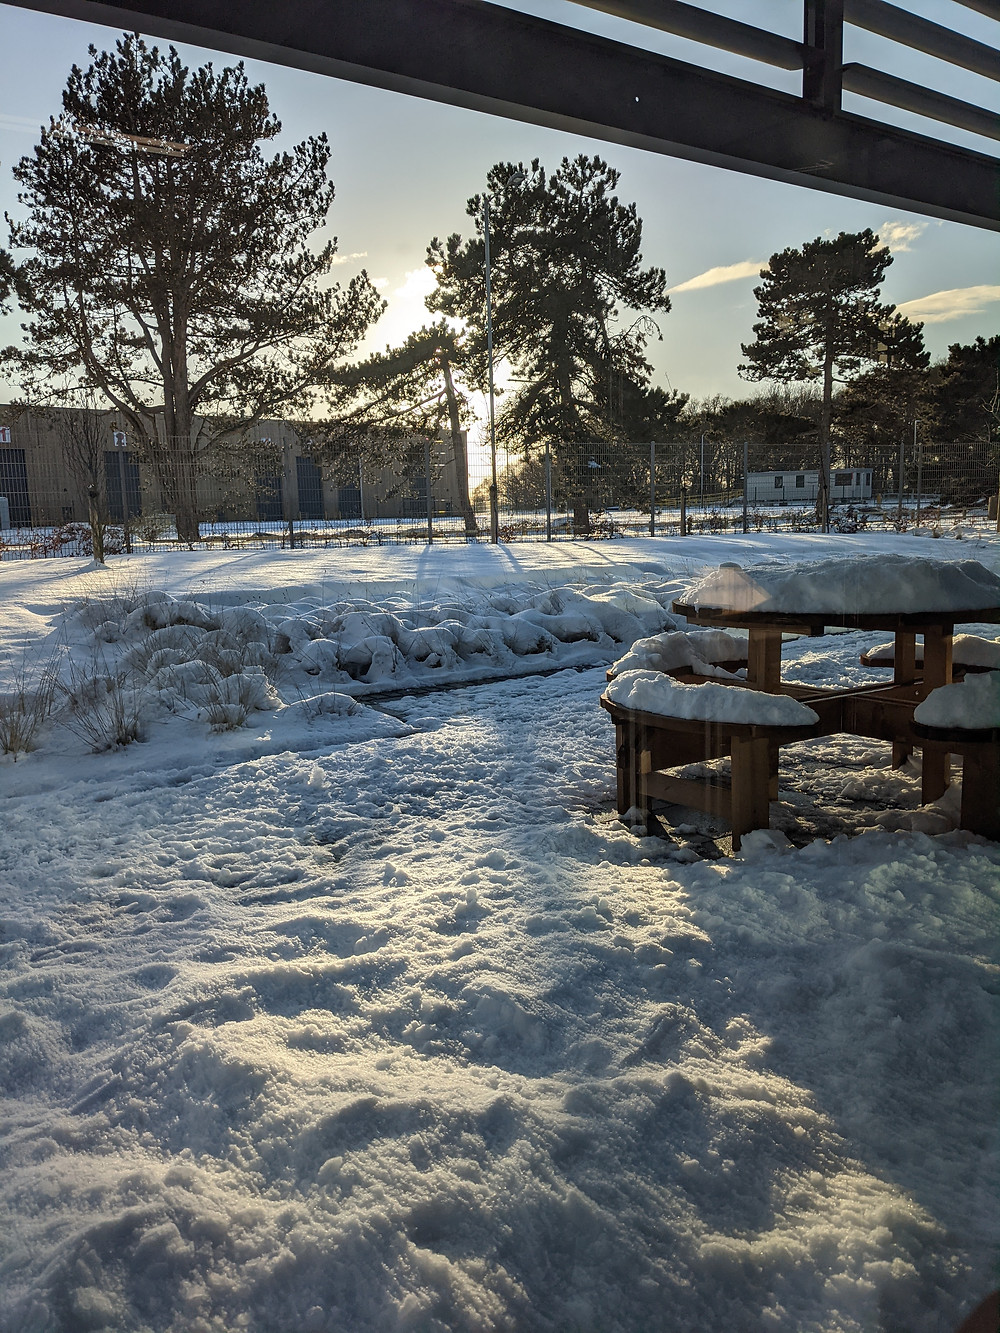 Snowy Ipswich